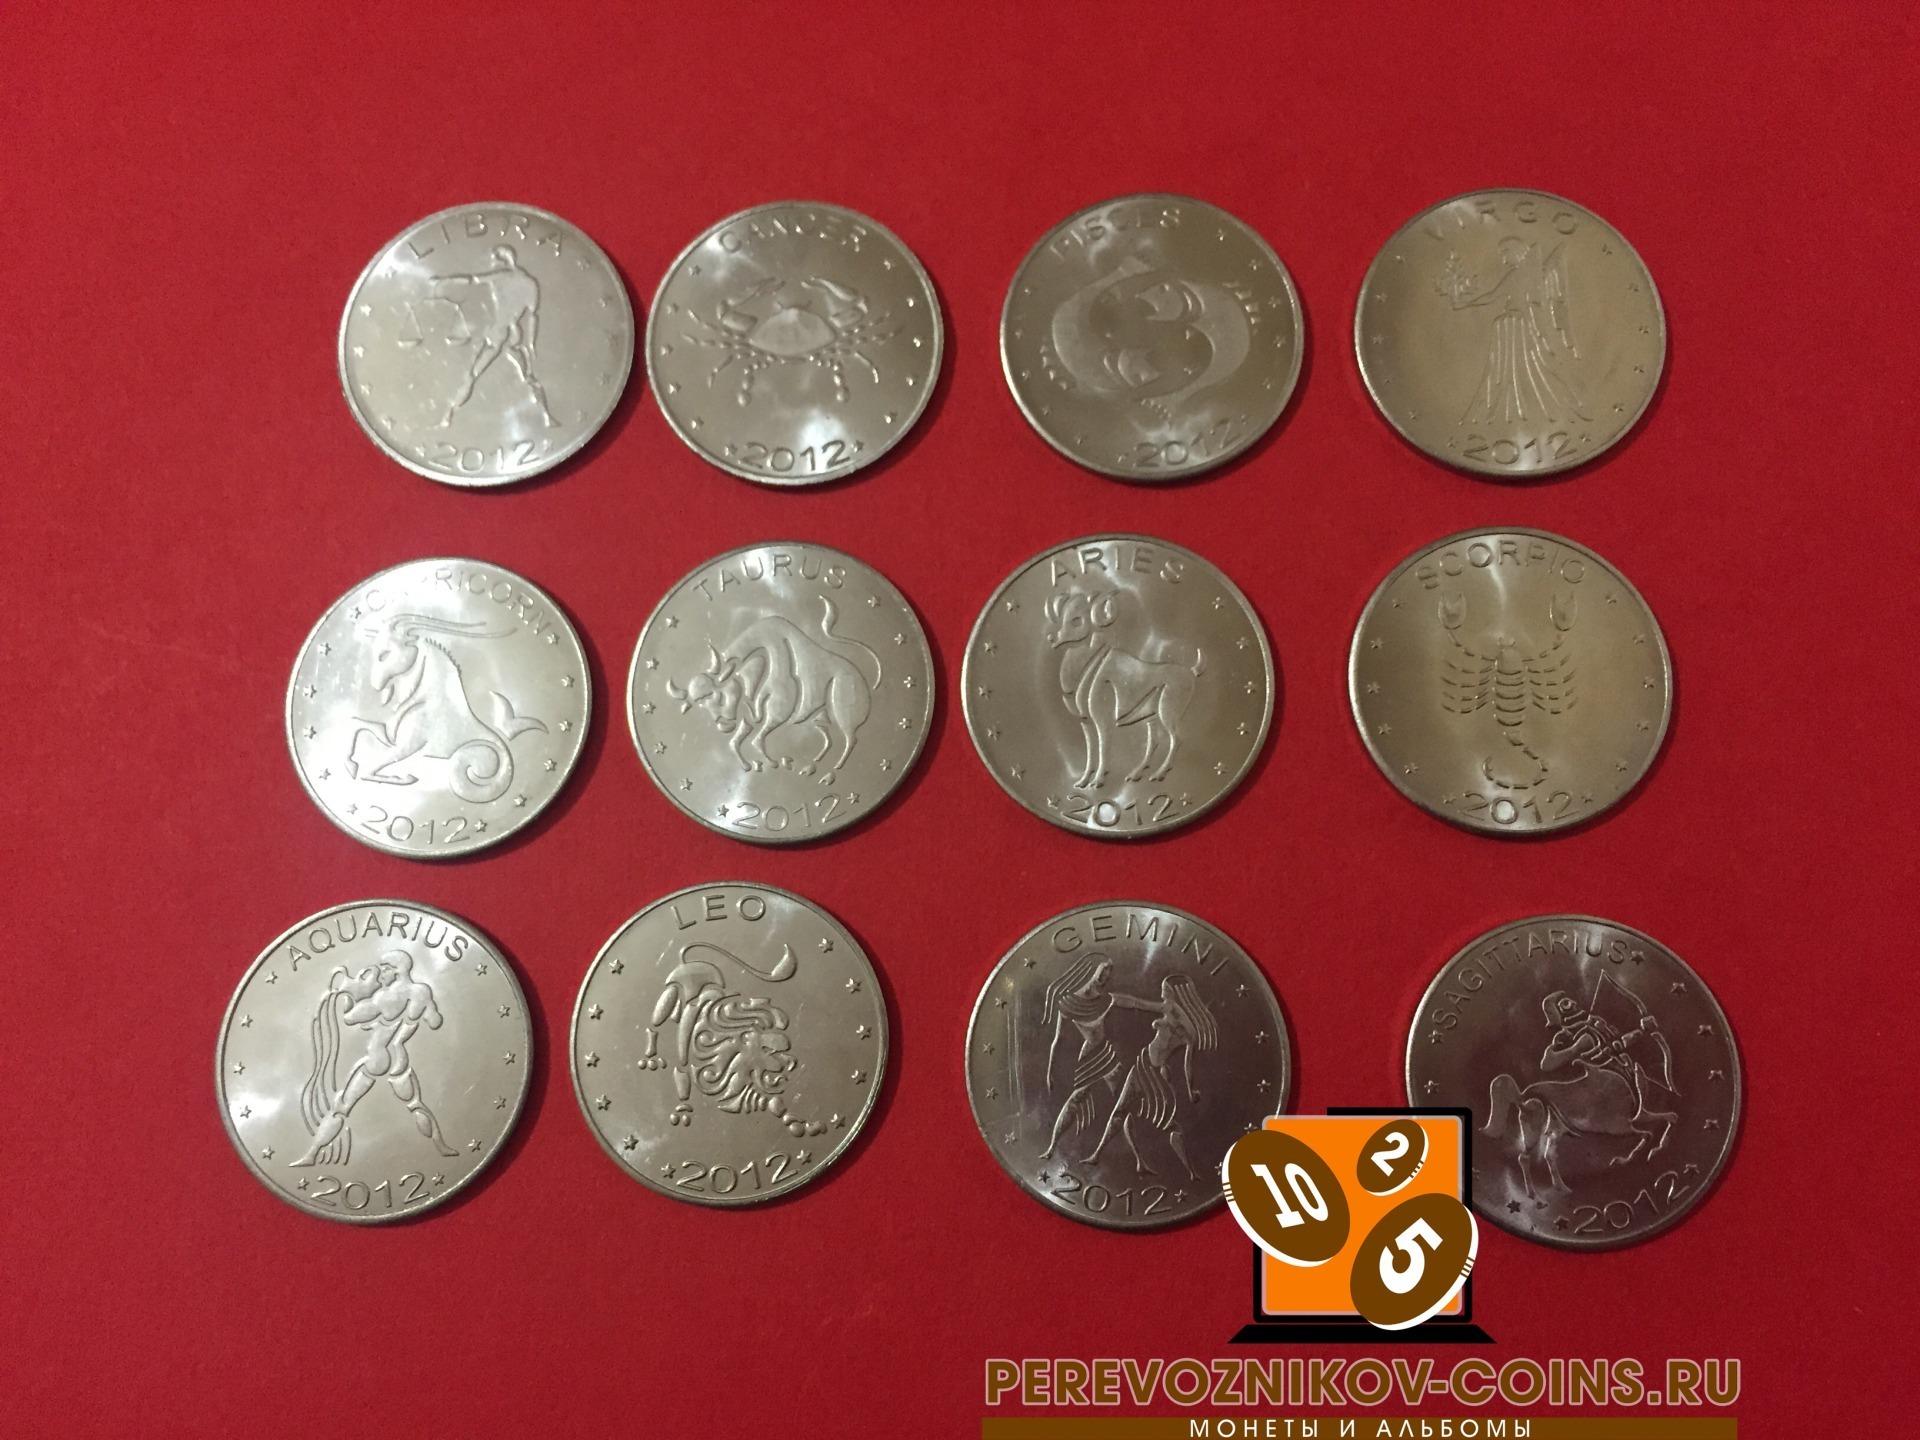 10 шиллингов Набор из 12 монет 2012 год Знаки зодиака